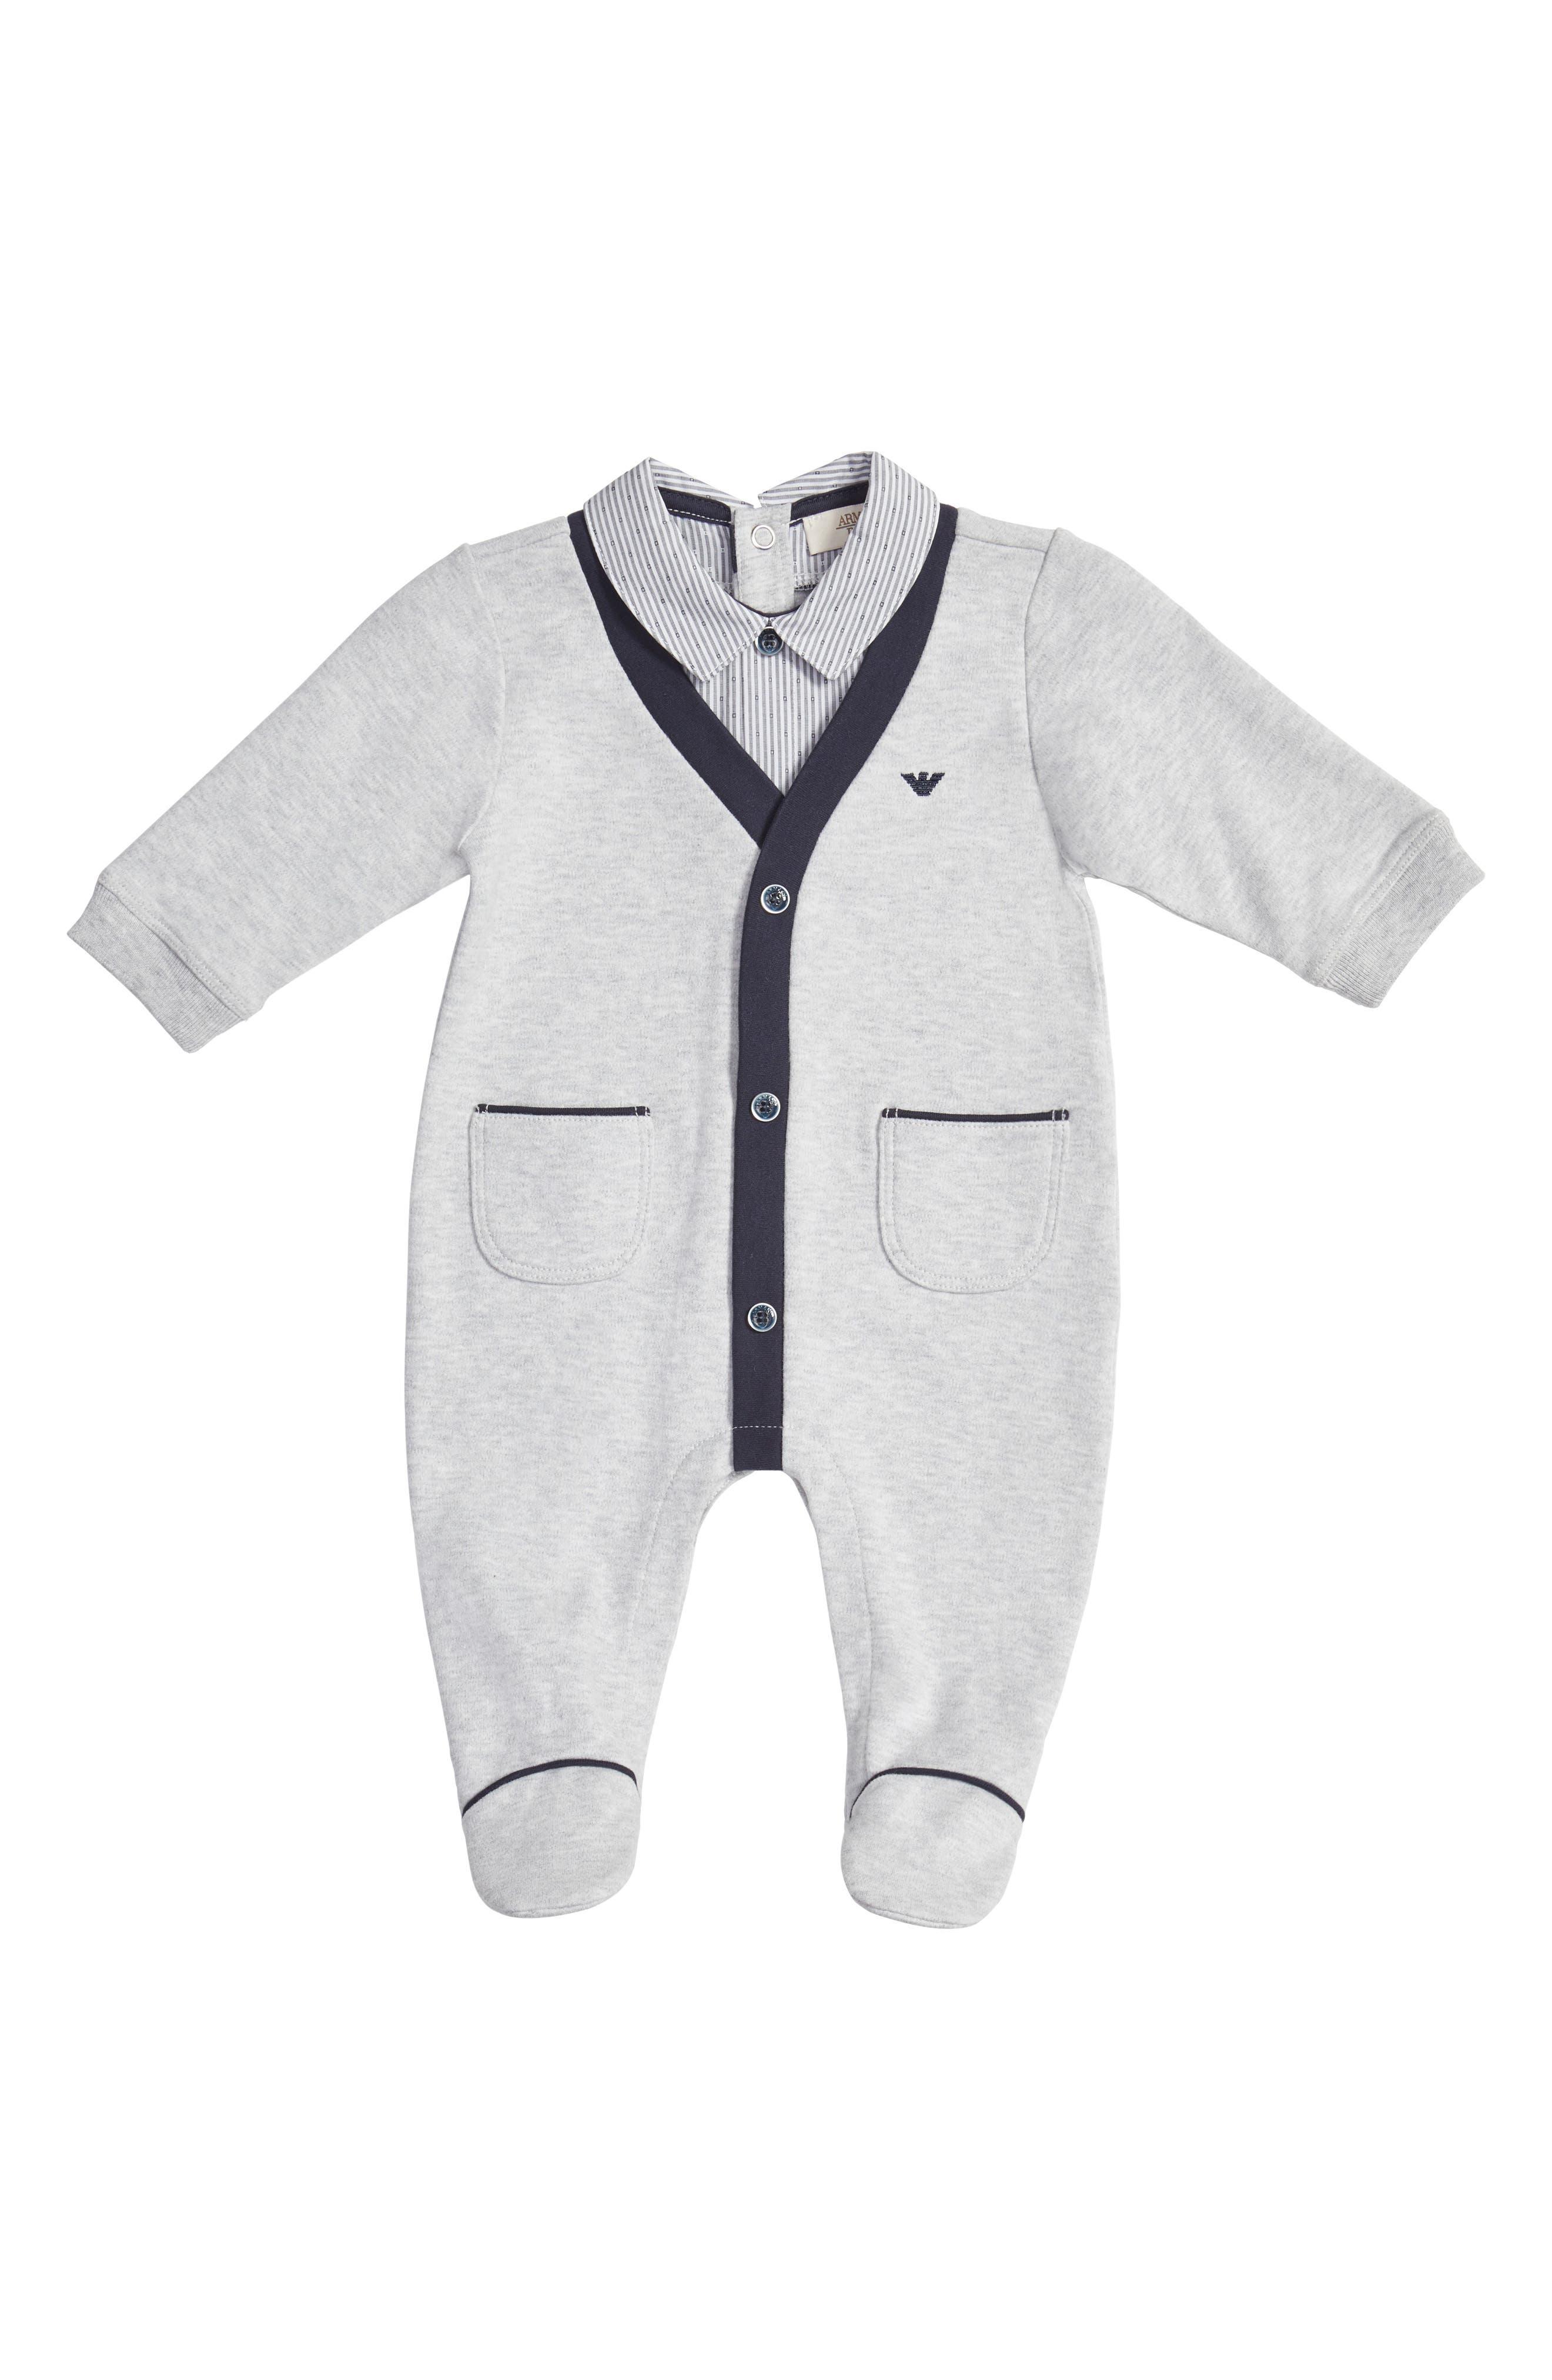 Main Image - Armani Junior Shirt & Cardigan Footie (Baby Boys)